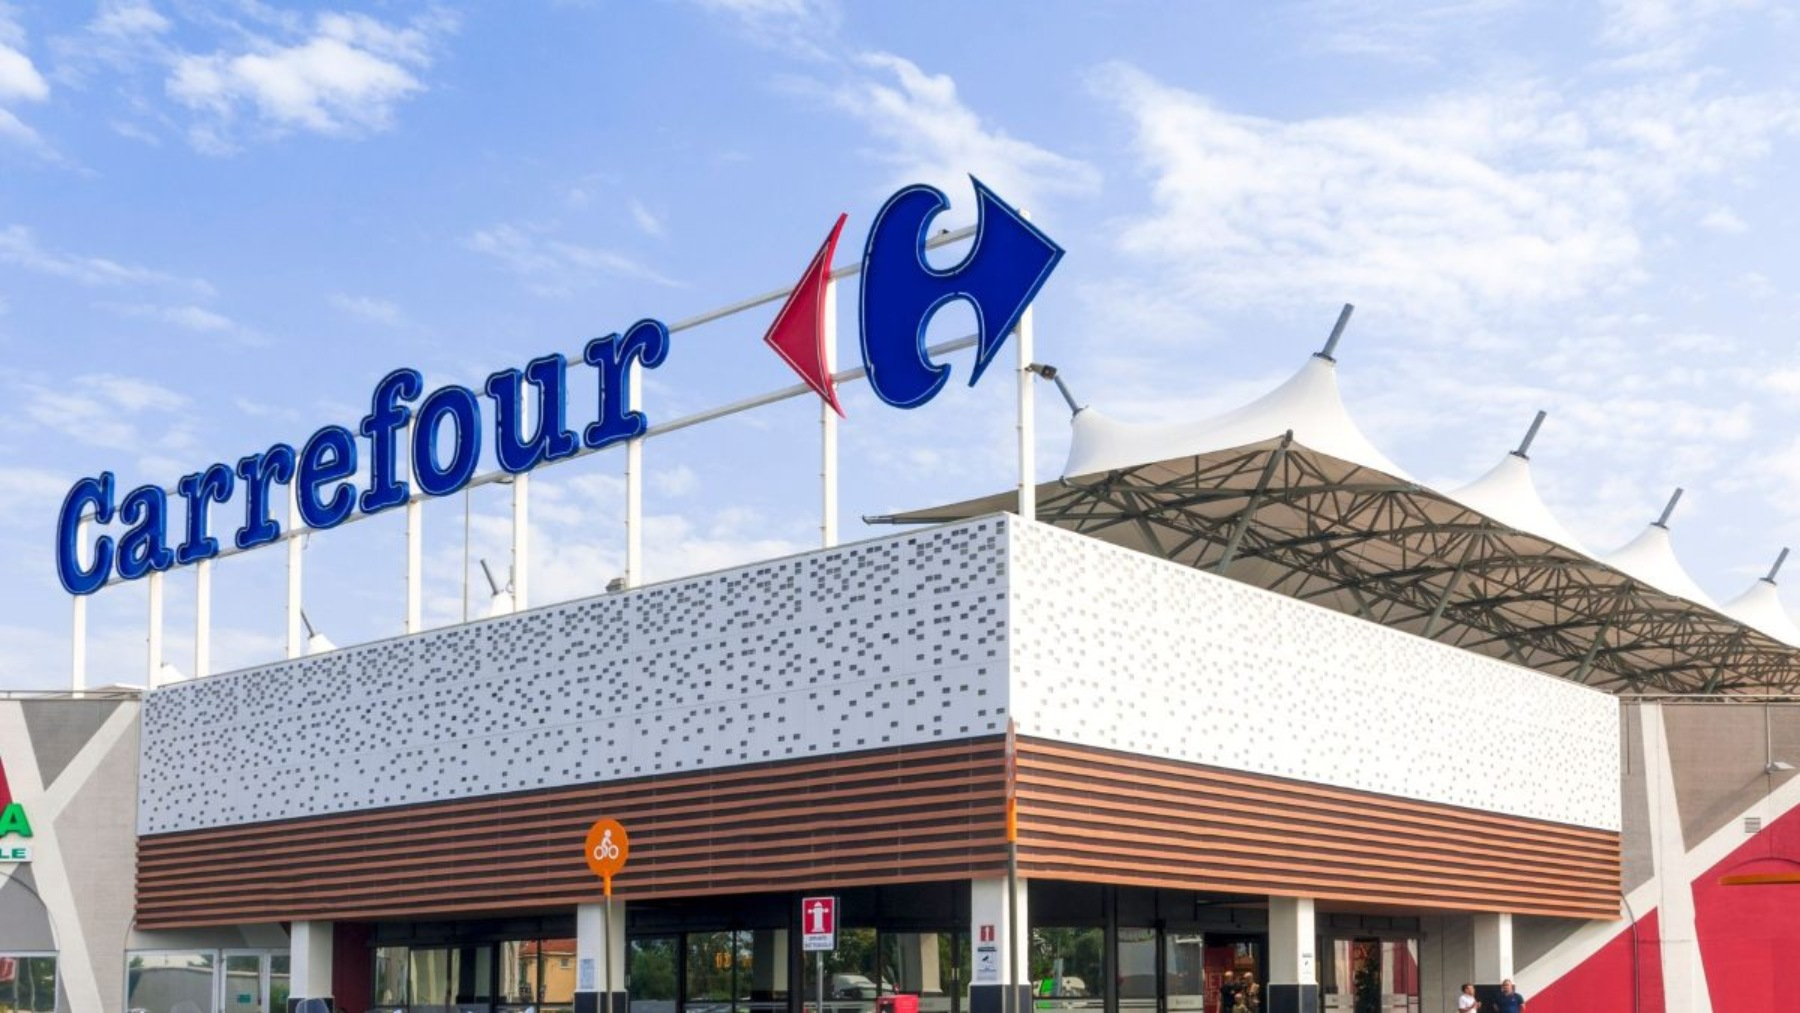 Llegan las rebajas a Carrefour